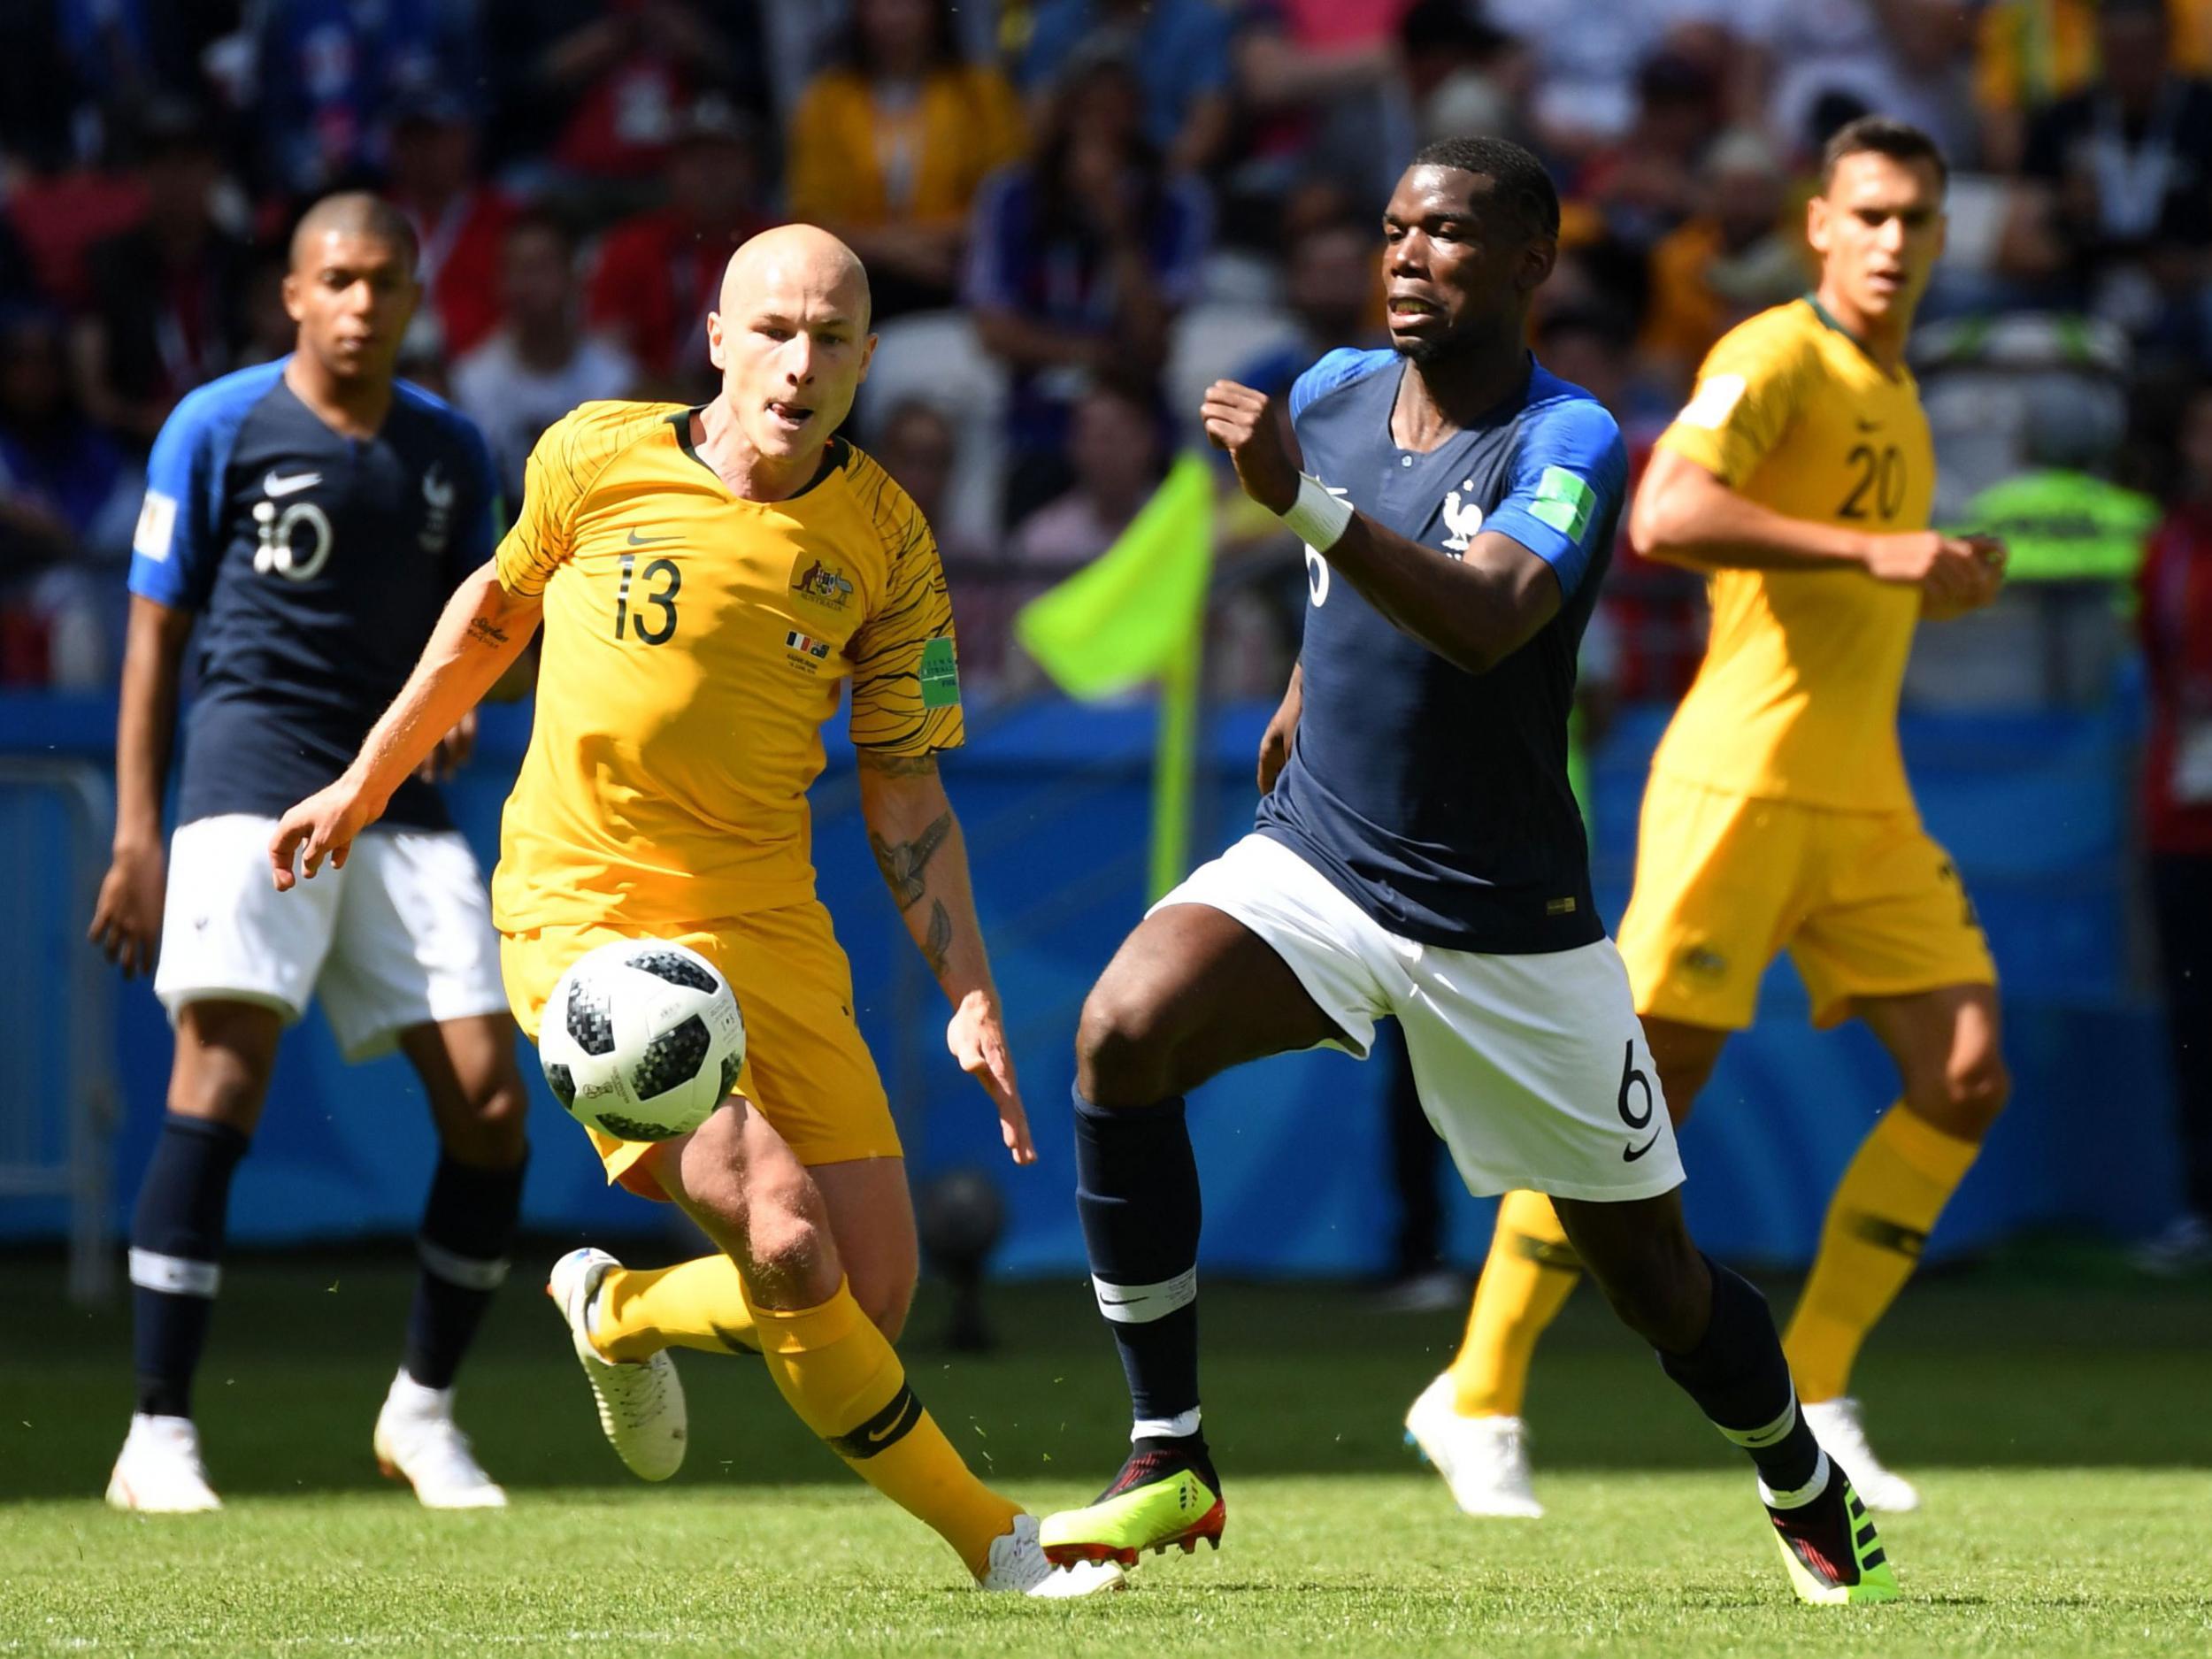 France vs Australia LIVE World Cup 2018: Latest score, goals and